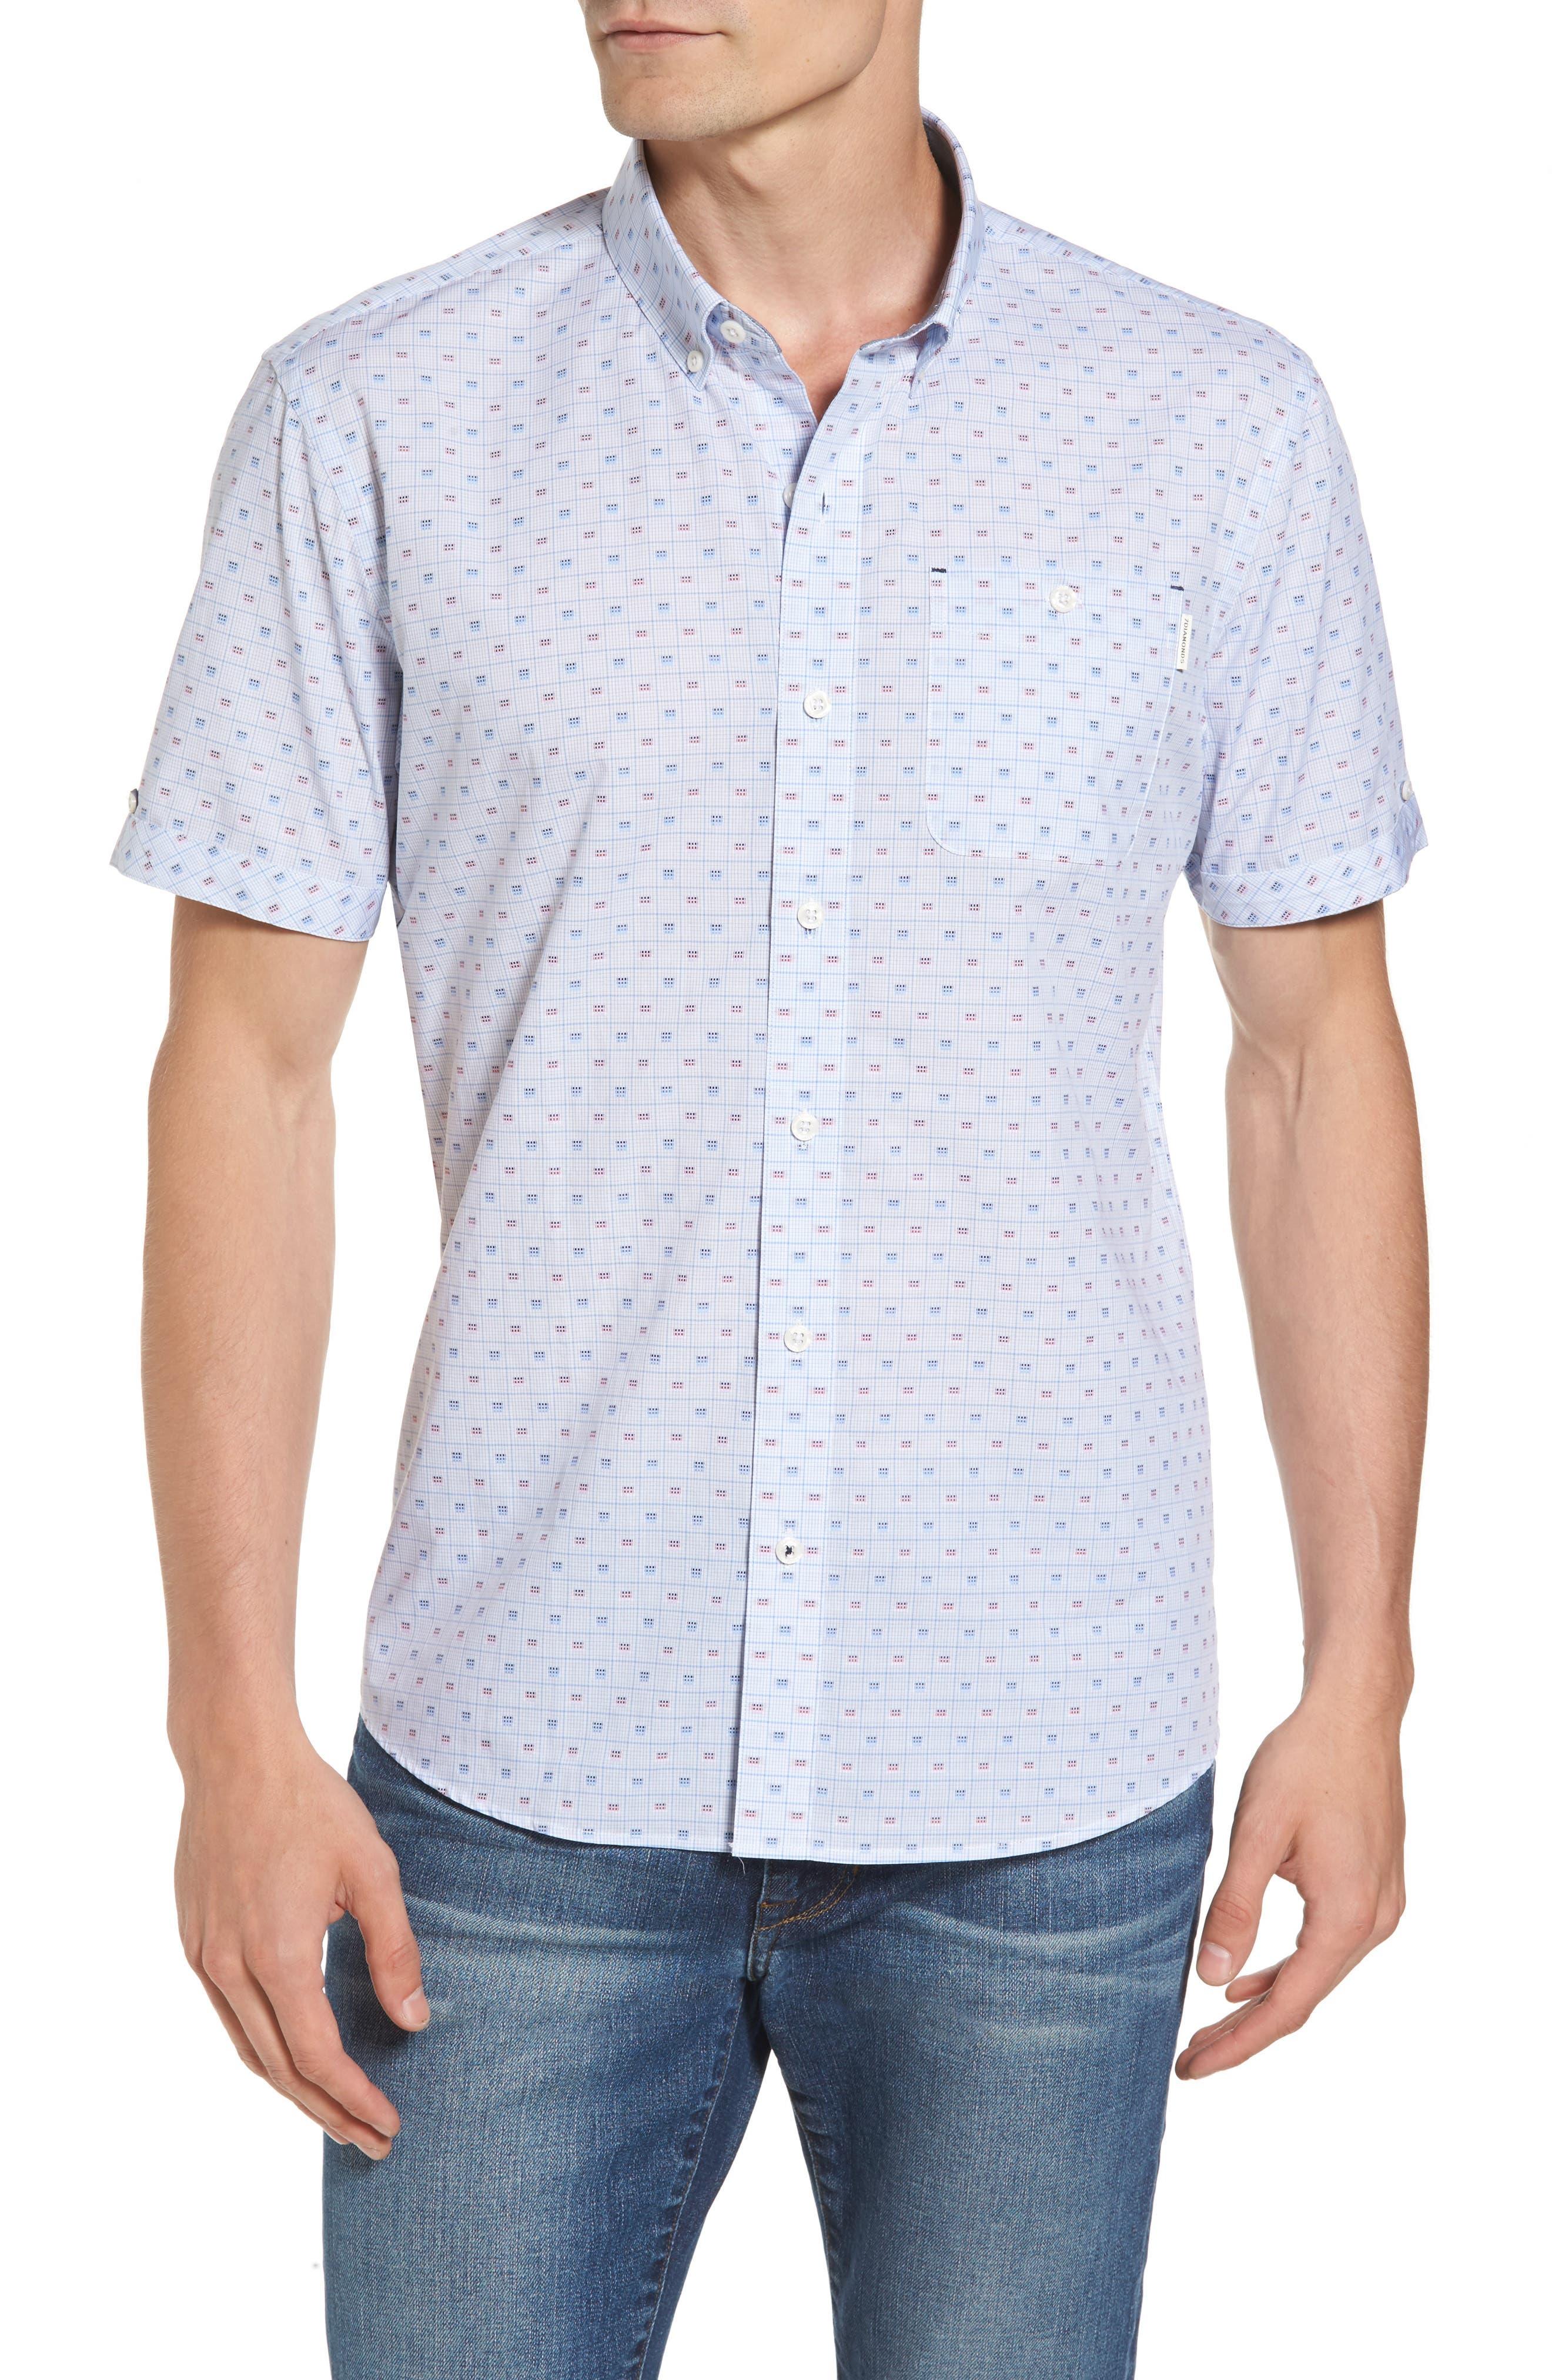 Main Image - 7 Diamonds Atmosphere Woven Shirt